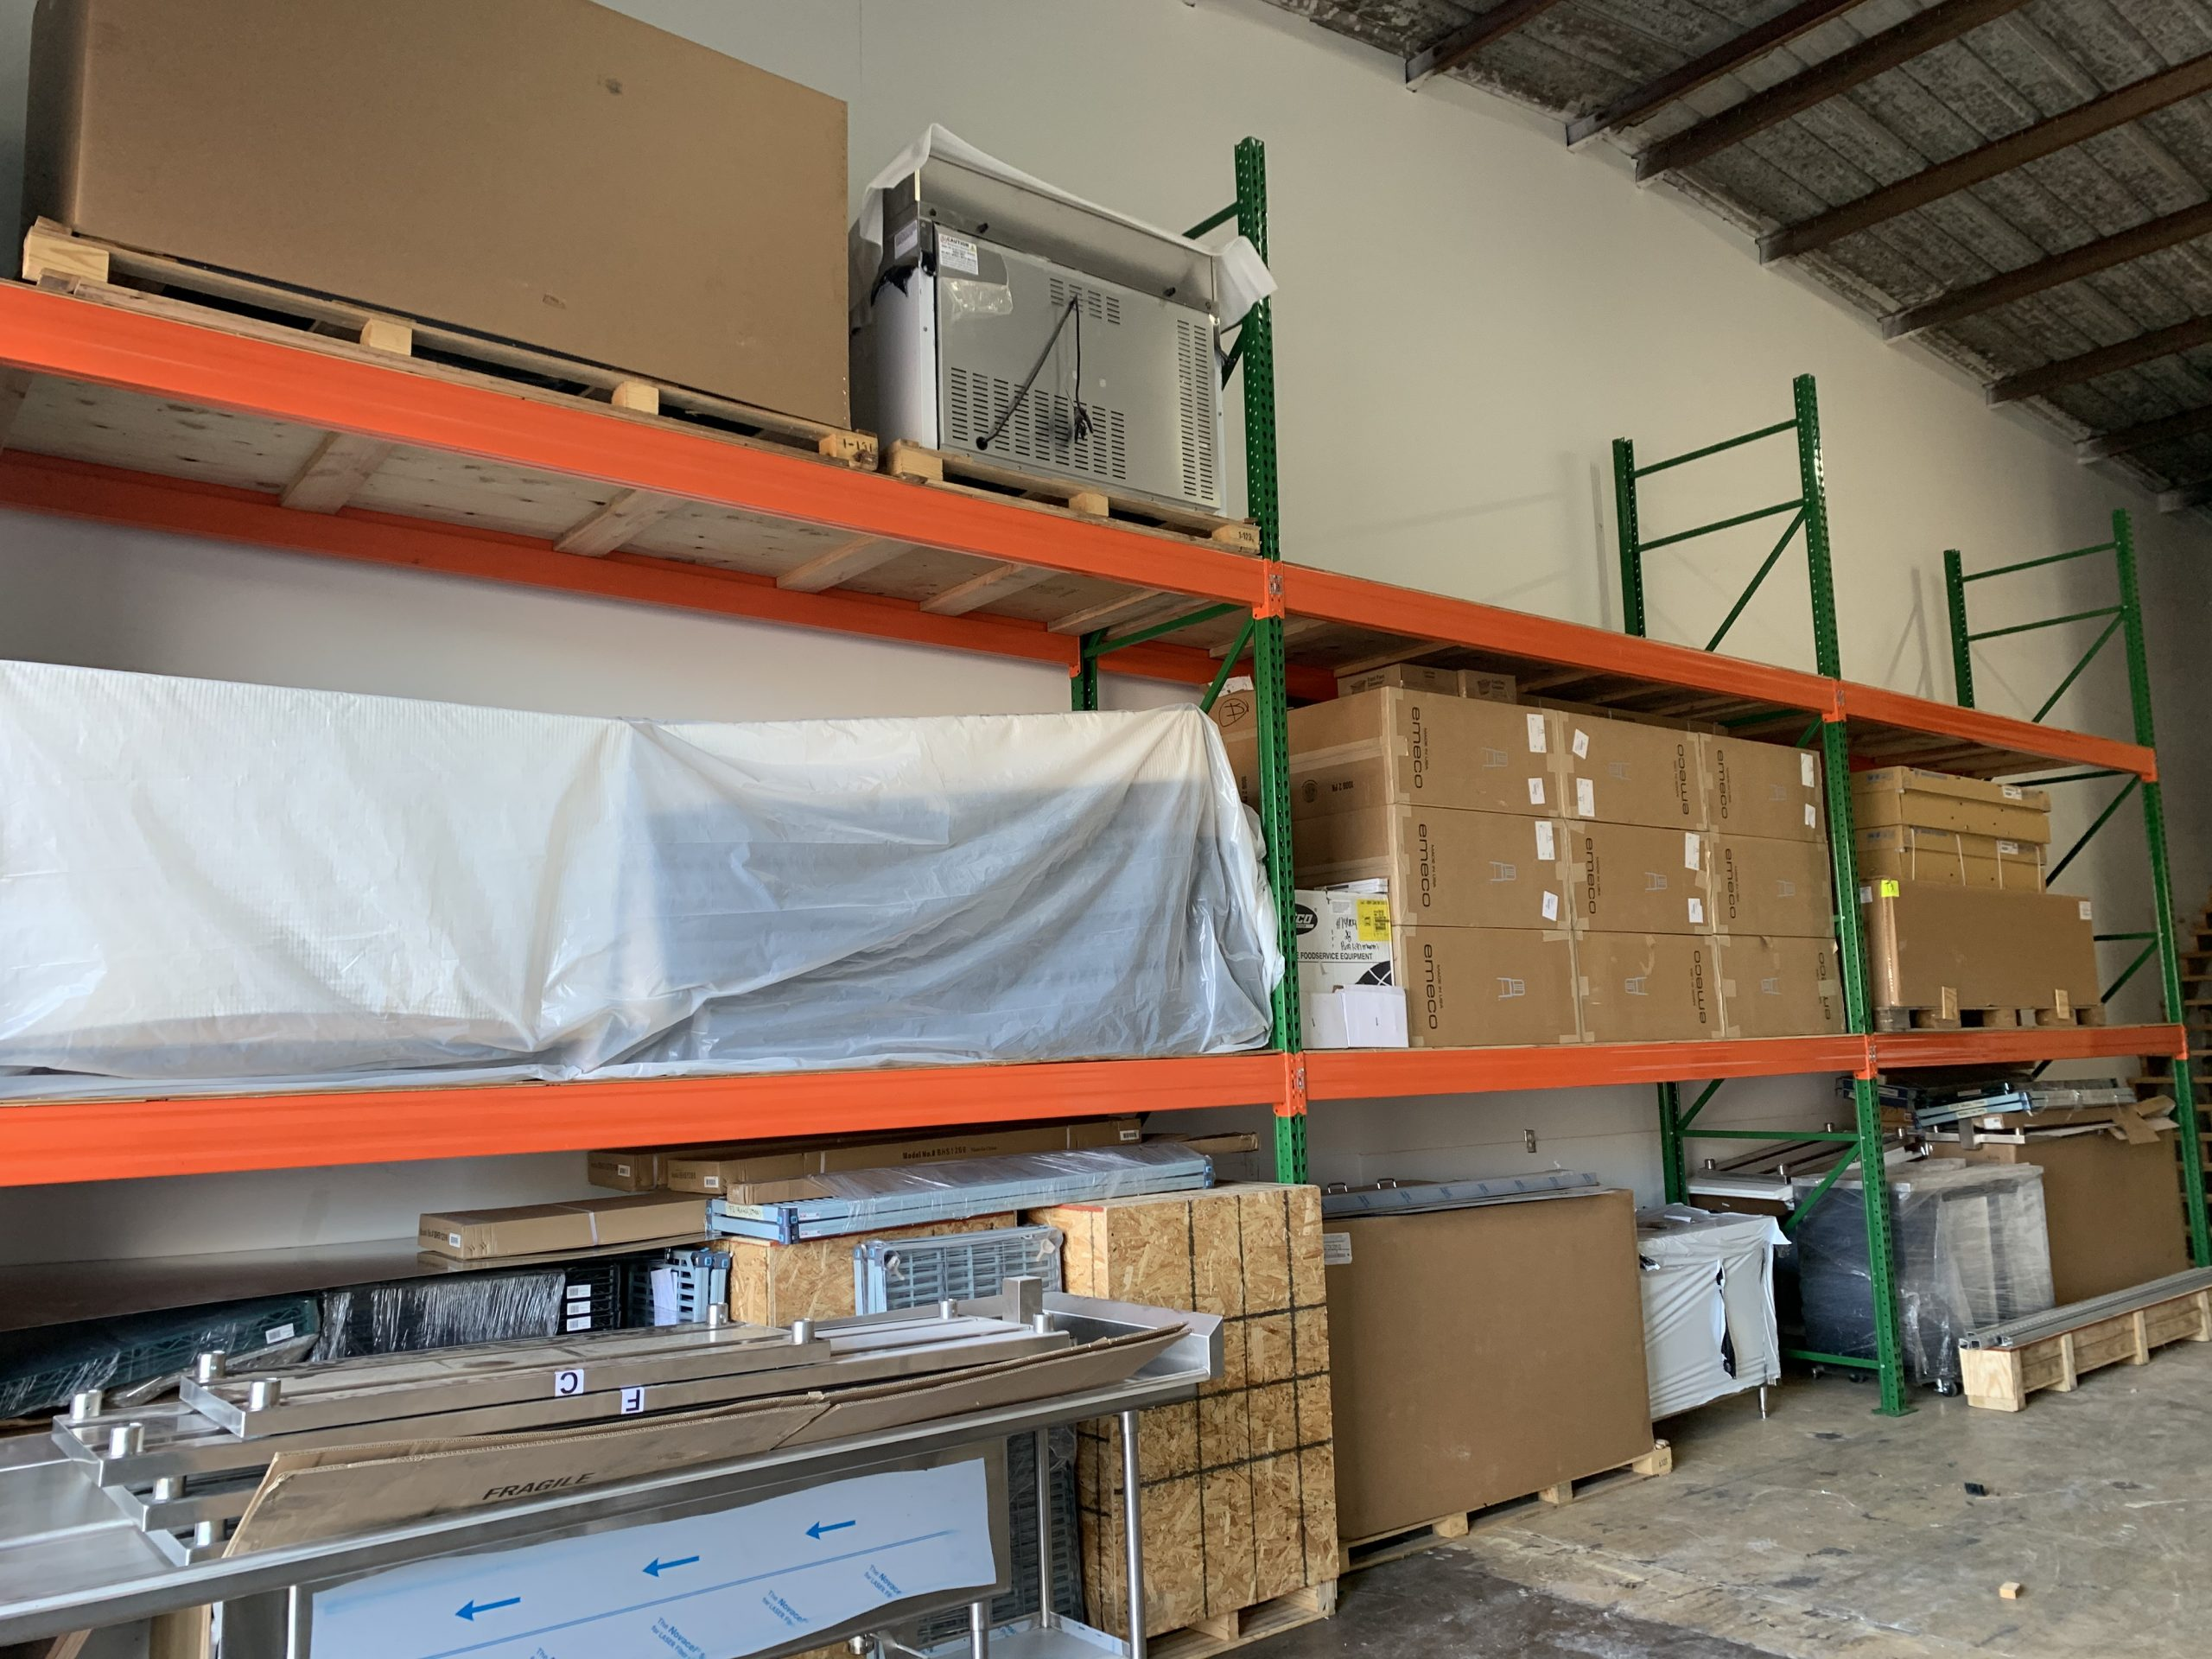 Fast Comet Warehouse 6 - Maui Hawaii - Movers